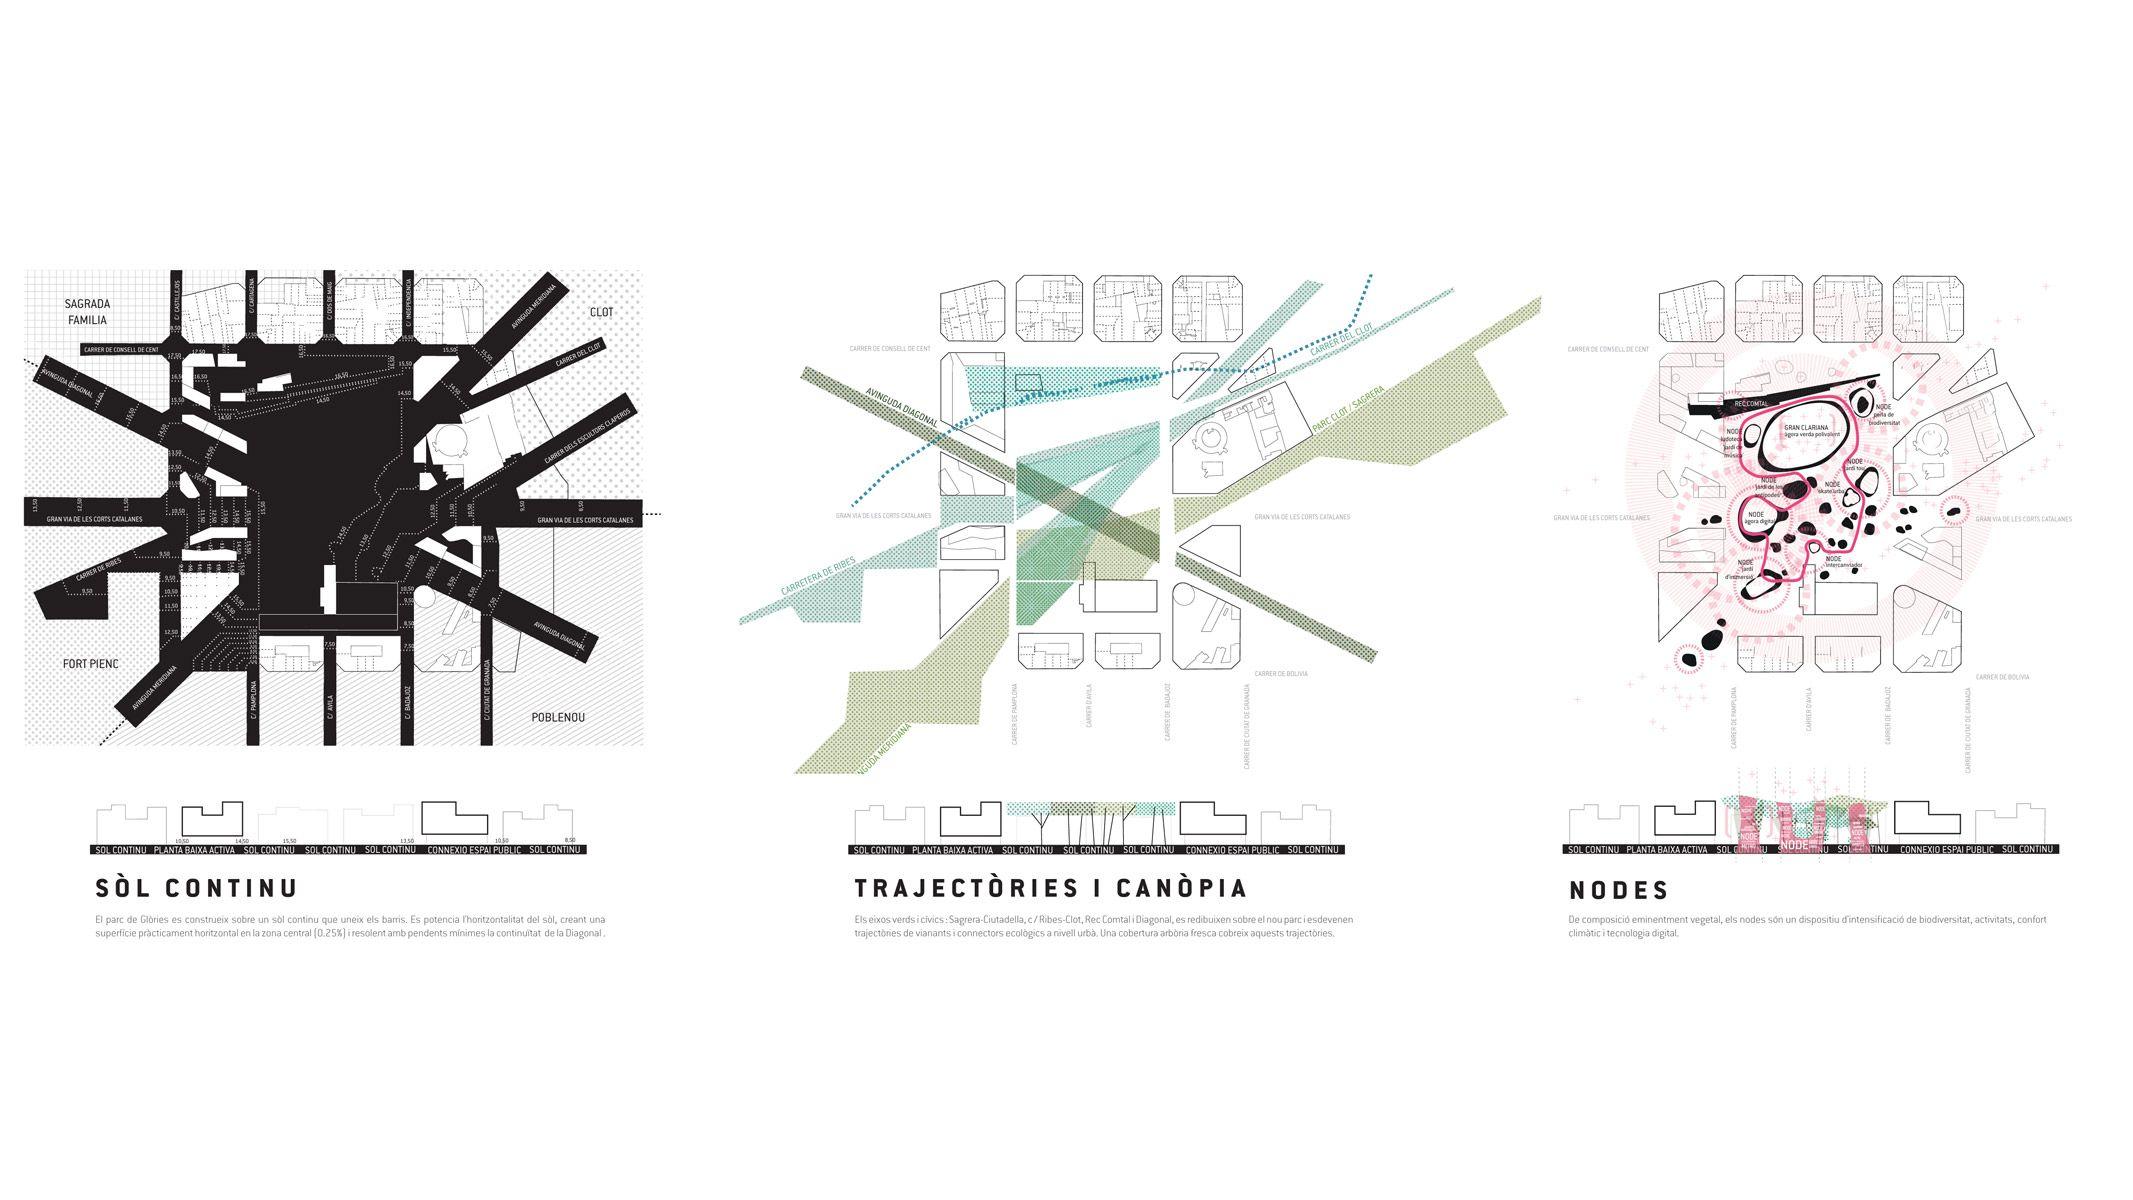 Barcelone Plaça De Les Glories Canopia Urbana Diagram Architecture Project Presentation Landscape